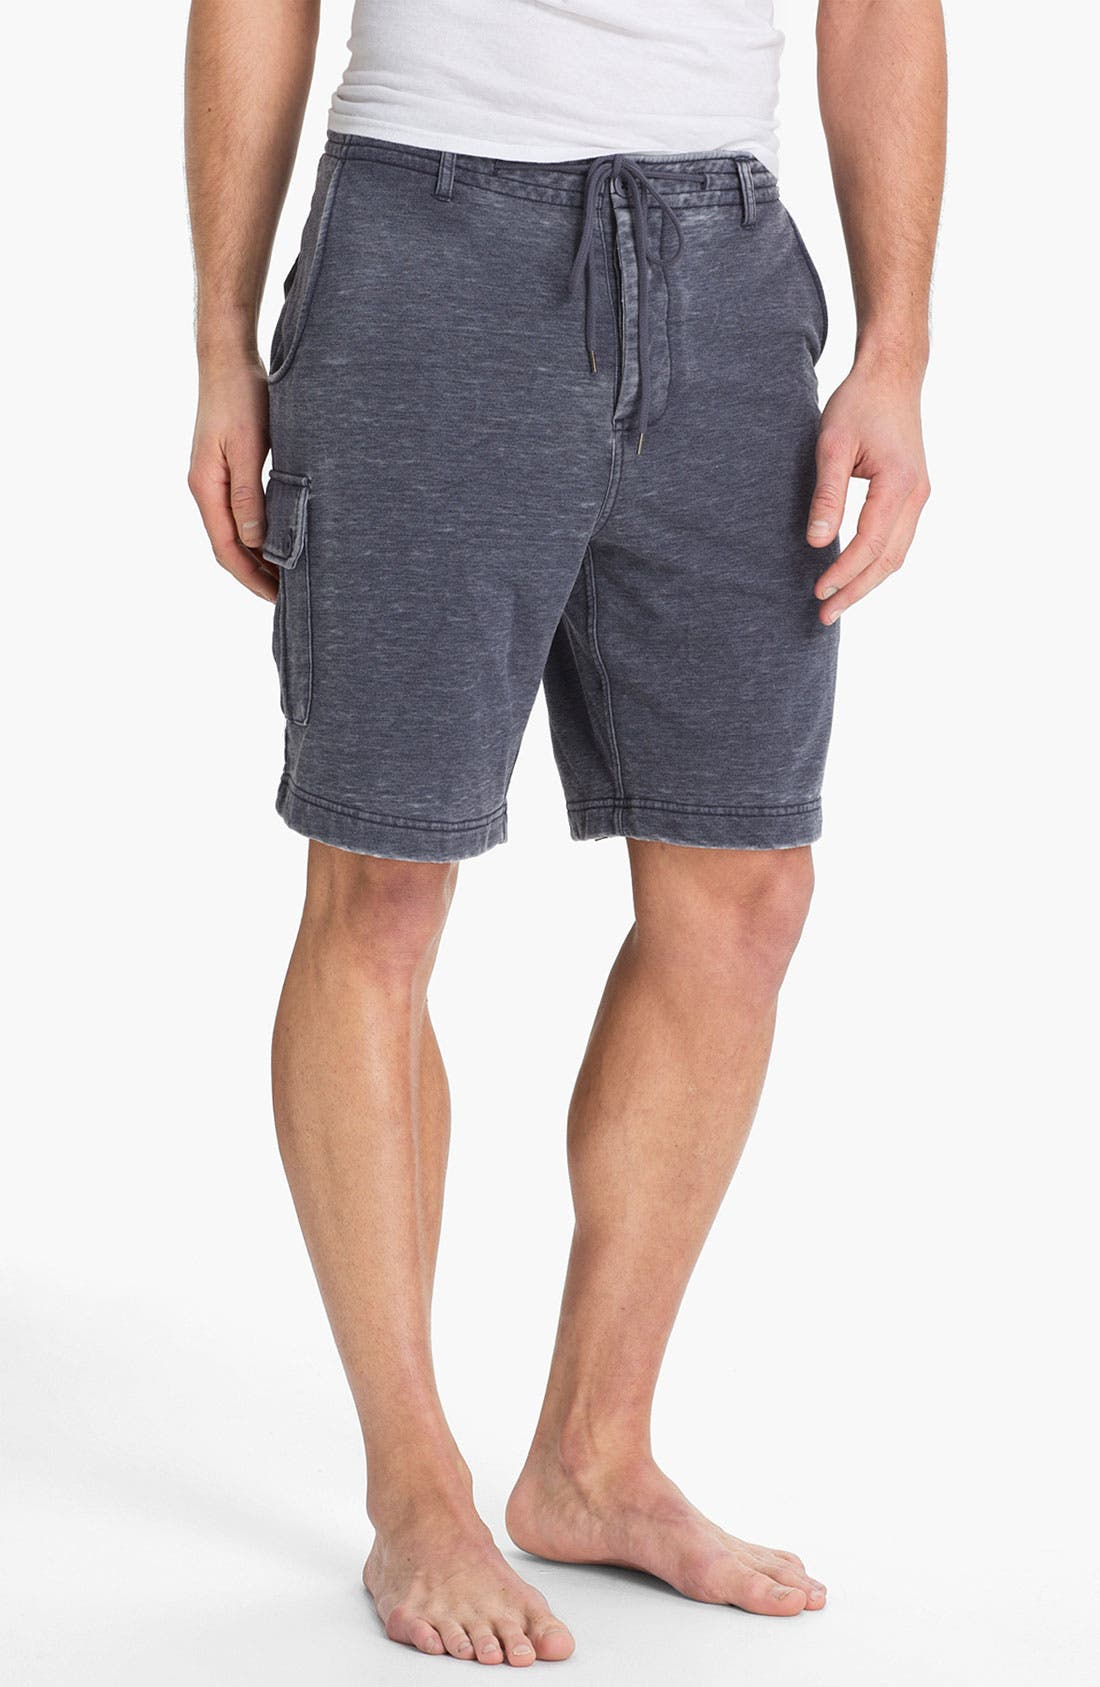 Alternate Image 1 Selected - Daniel Buchler Cotton & Polyester Overwashed Cargo Shorts